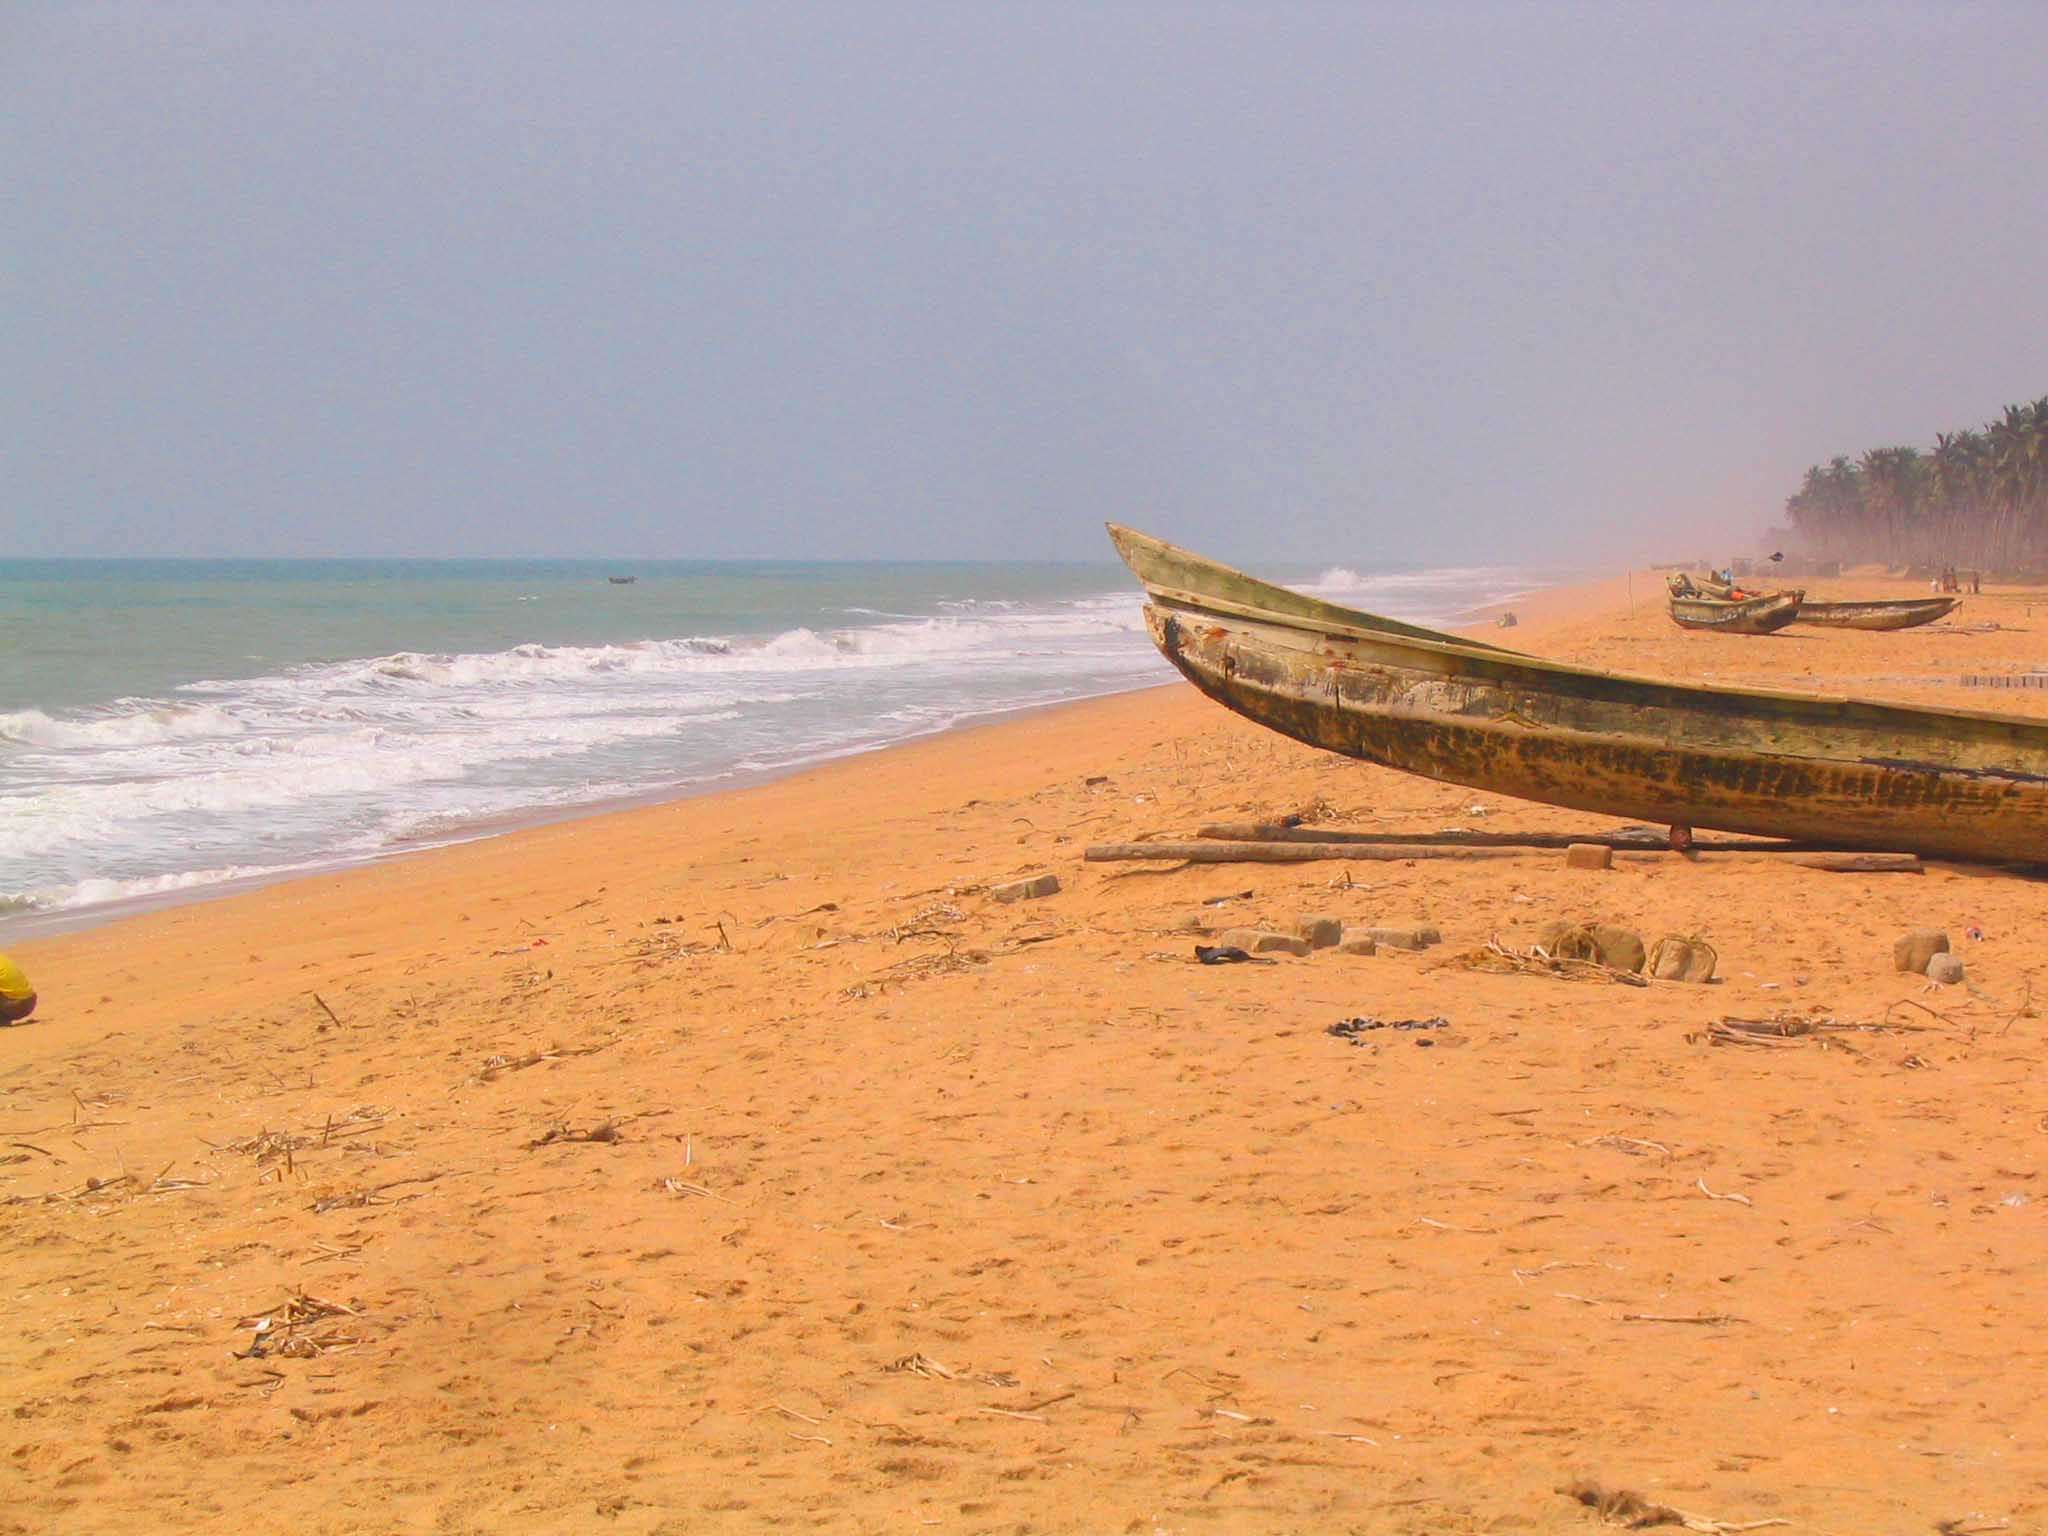 Sunday Spotlight: Ouidah (Benin) – Andy's World Journeys